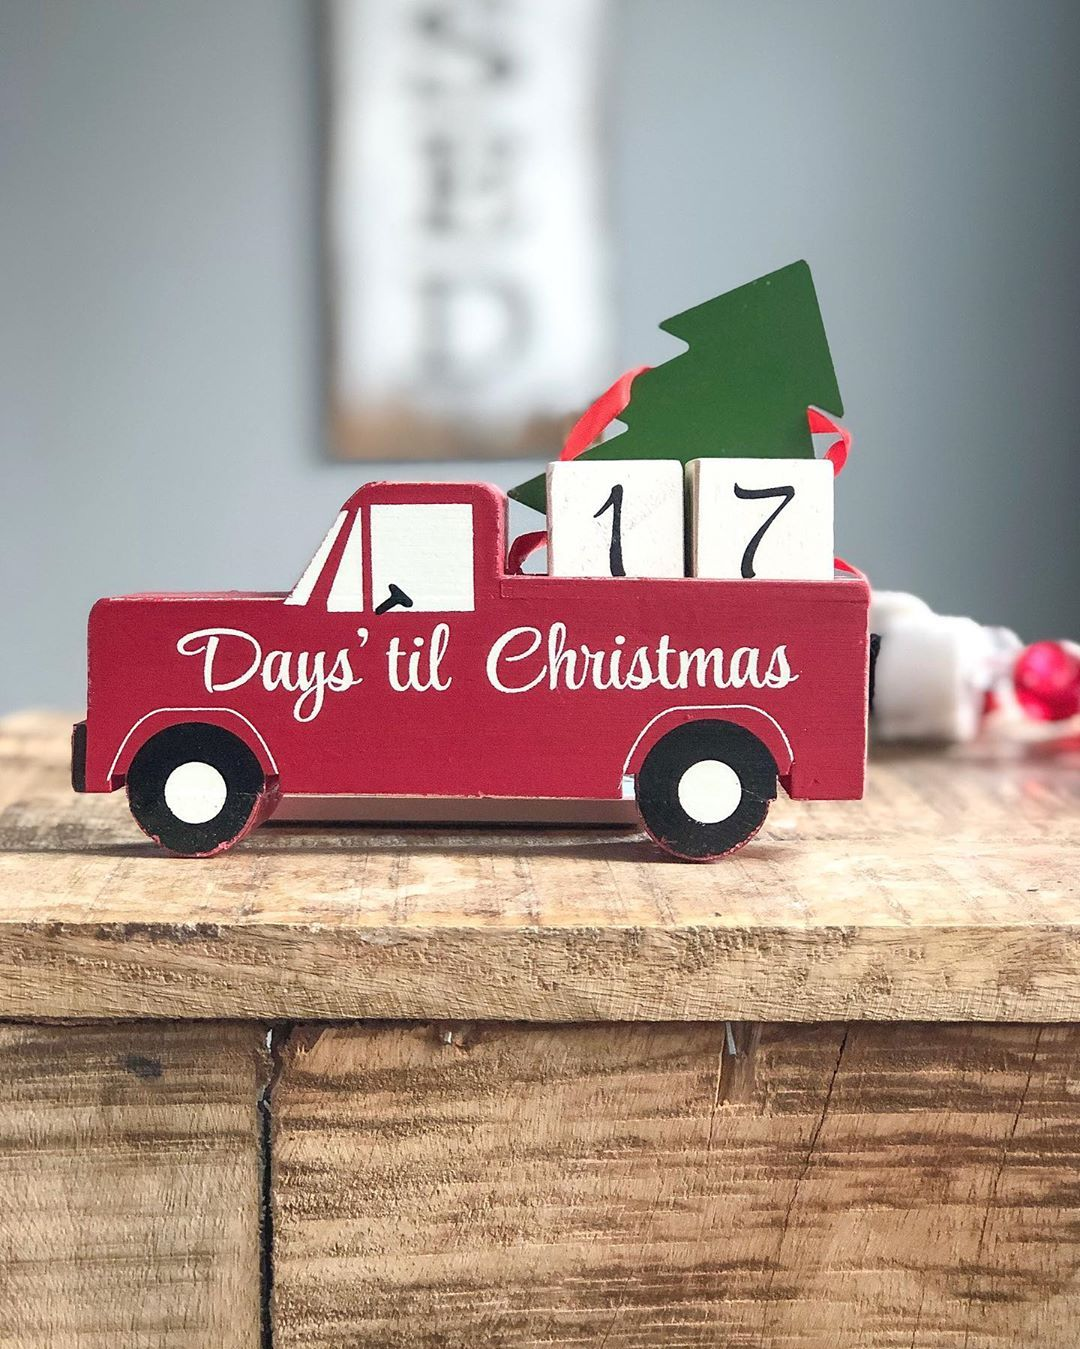 Santa comes to town in 17 days!  • • • •  #LTKholidayathome #LTKhome #LTKunder10... #americanfarmhouse #americanfarmhousestyle #christmascountdown #christmasjoy #cottagefarmhouse #diyfarmhousedecor #farmhousedecor